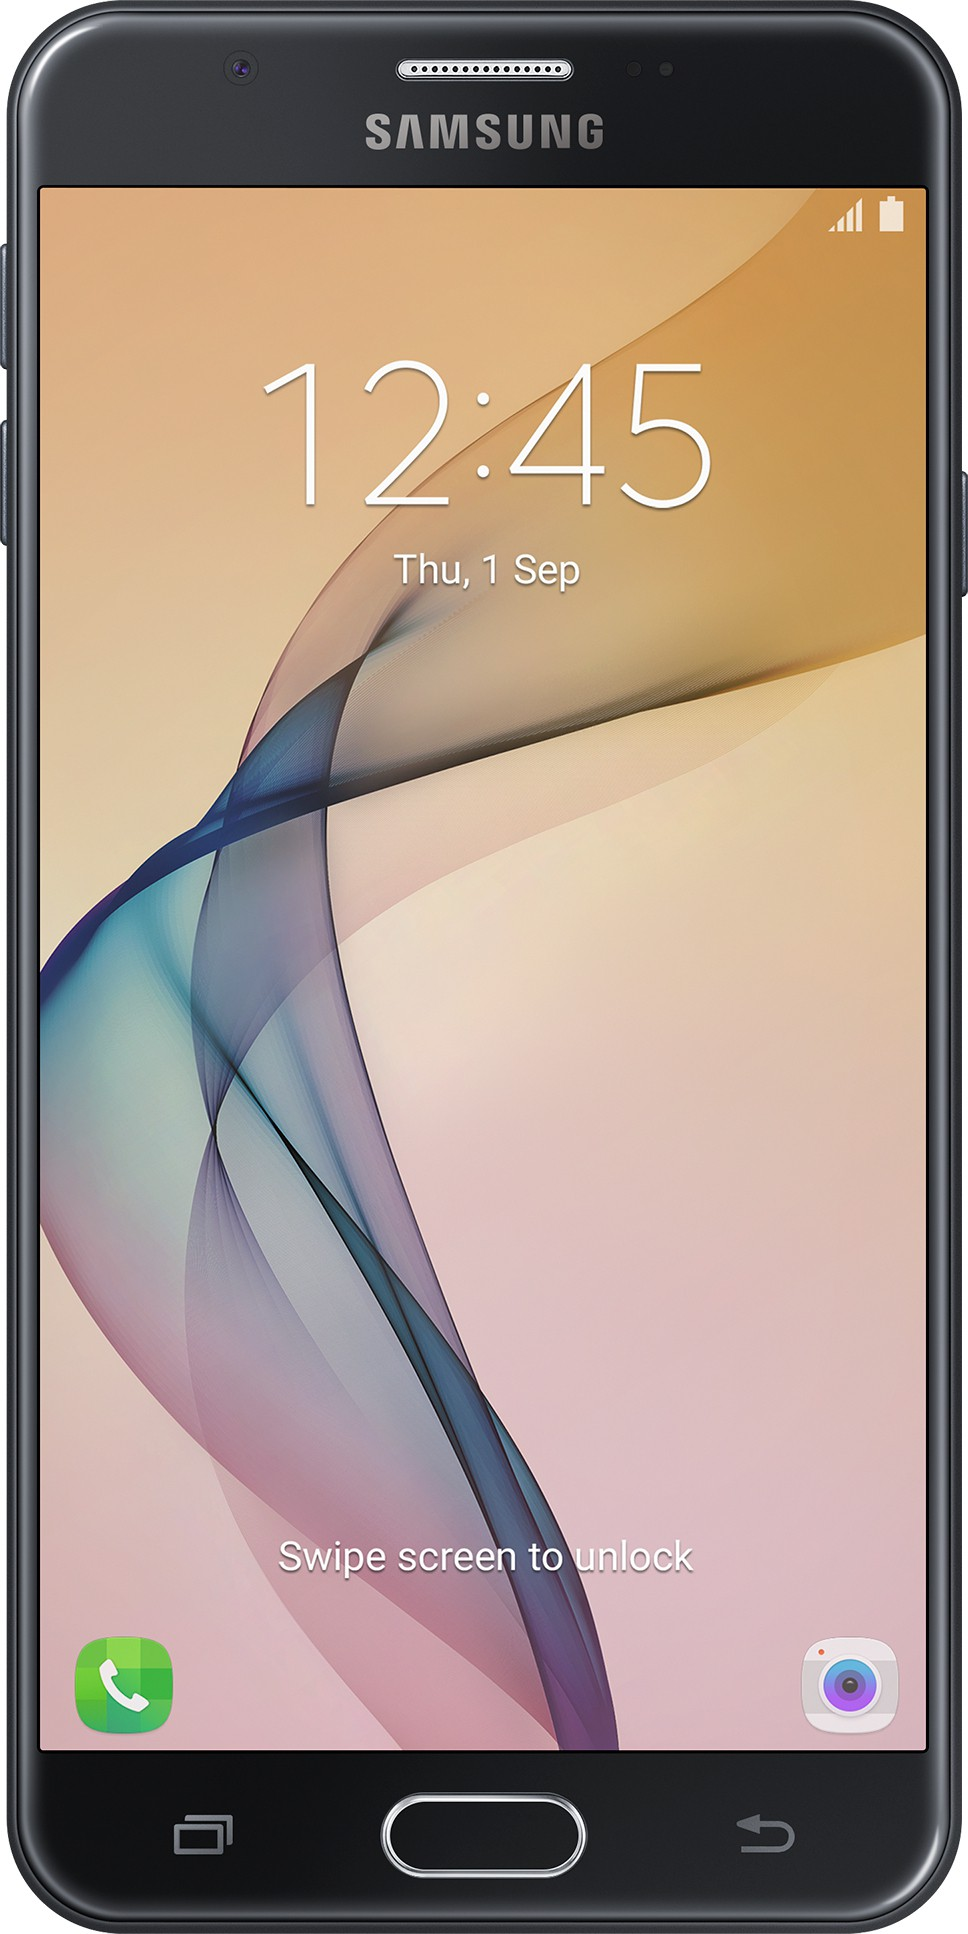 Samsung Galaxy J5 Prime (Black, 16 GB)(2 GB RAM) image